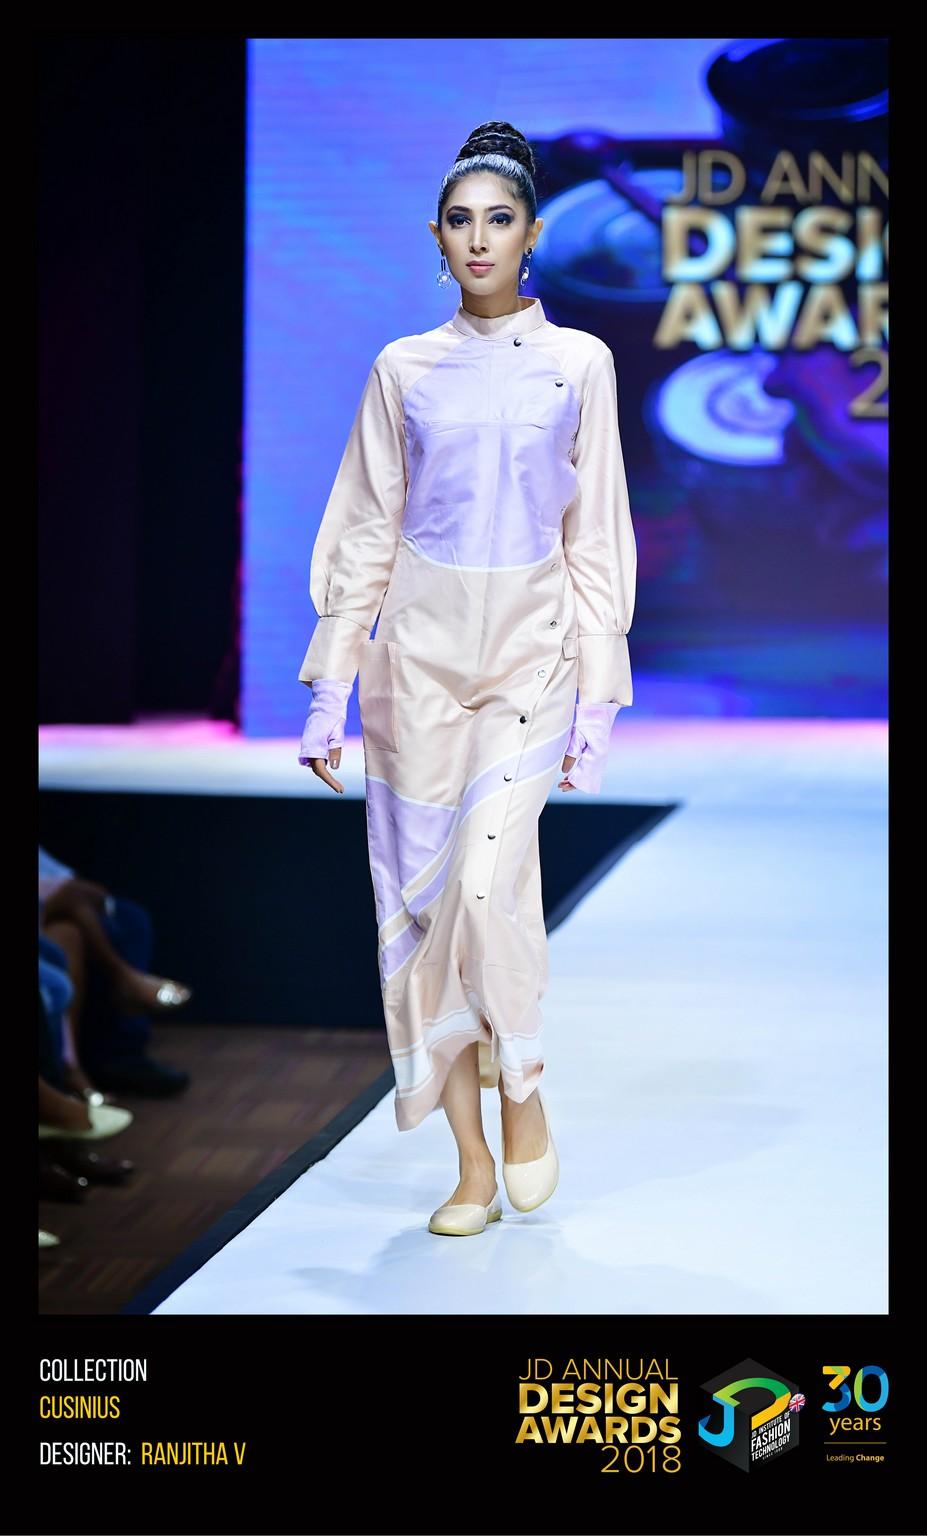 Cusinius – Change – JD Annual Design Awards 2018 | Designer: Ranjitha | Photography : Jerin Nath (@jerin_nath) cusinius - CUSINIUS 6 - Cusinius – Change – JD Annual Design Awards 2018